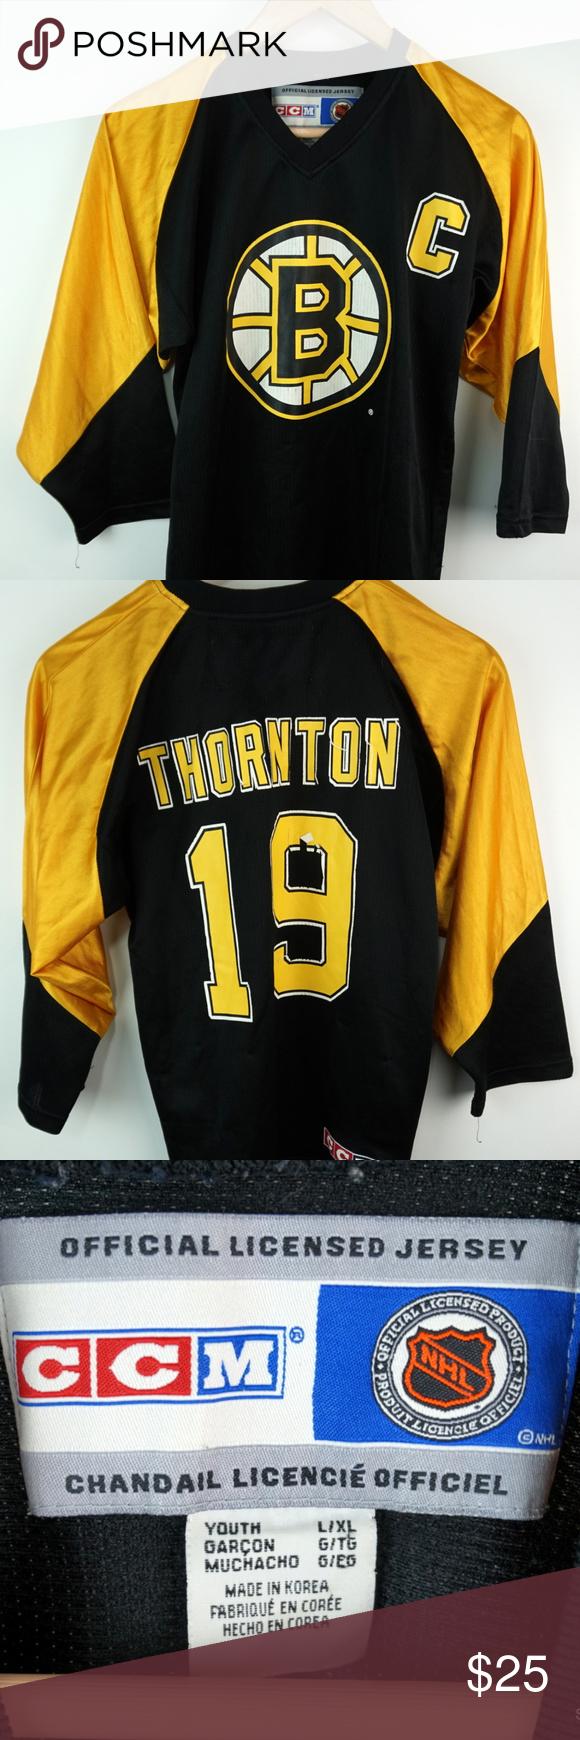 0bc185d8de8 VTG Joe Thornton Boston Bruins CCM Hockey Jersey VTG Joe Thornton Boston  Bruins CCM NHL Hockey